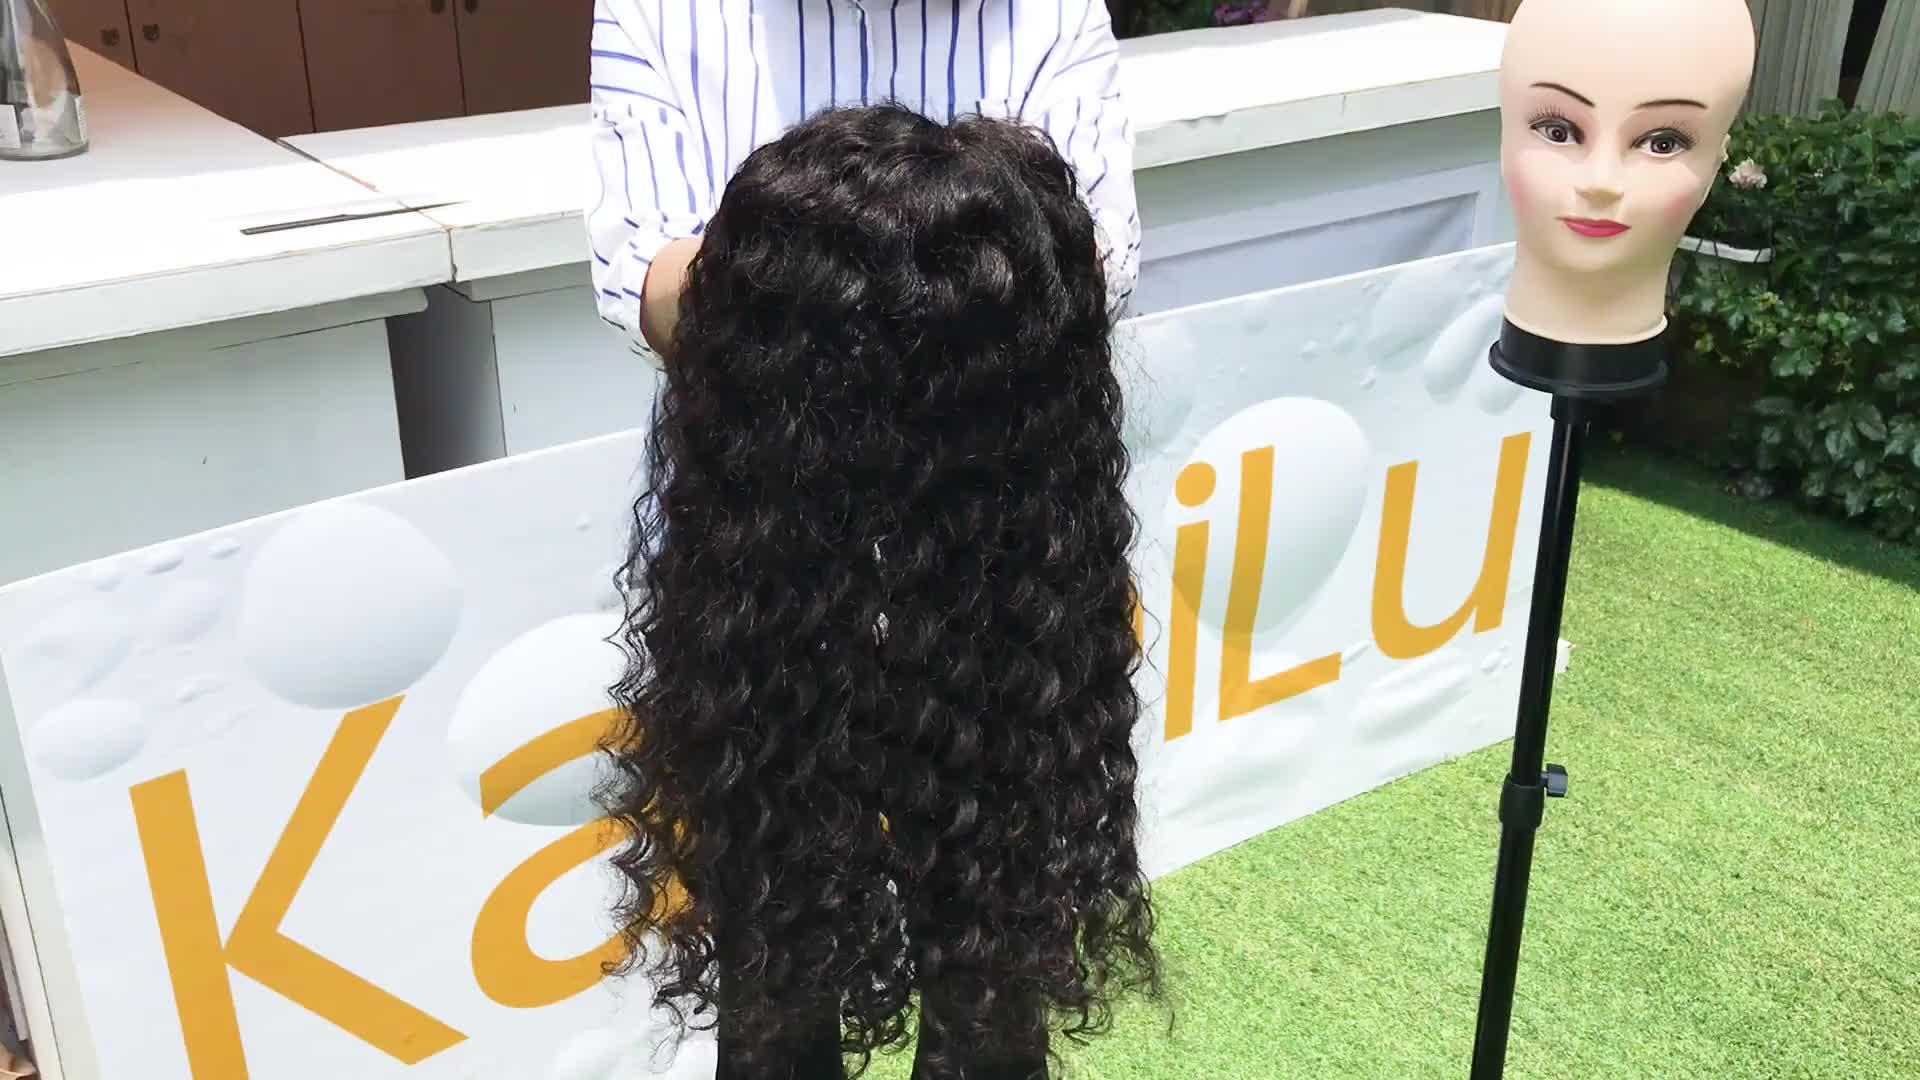 Afro kinky 10a  human hair full lace wig in malaysia kuala lumpur,glueless full lace wigs wholesale,100 % human hair wig bangk